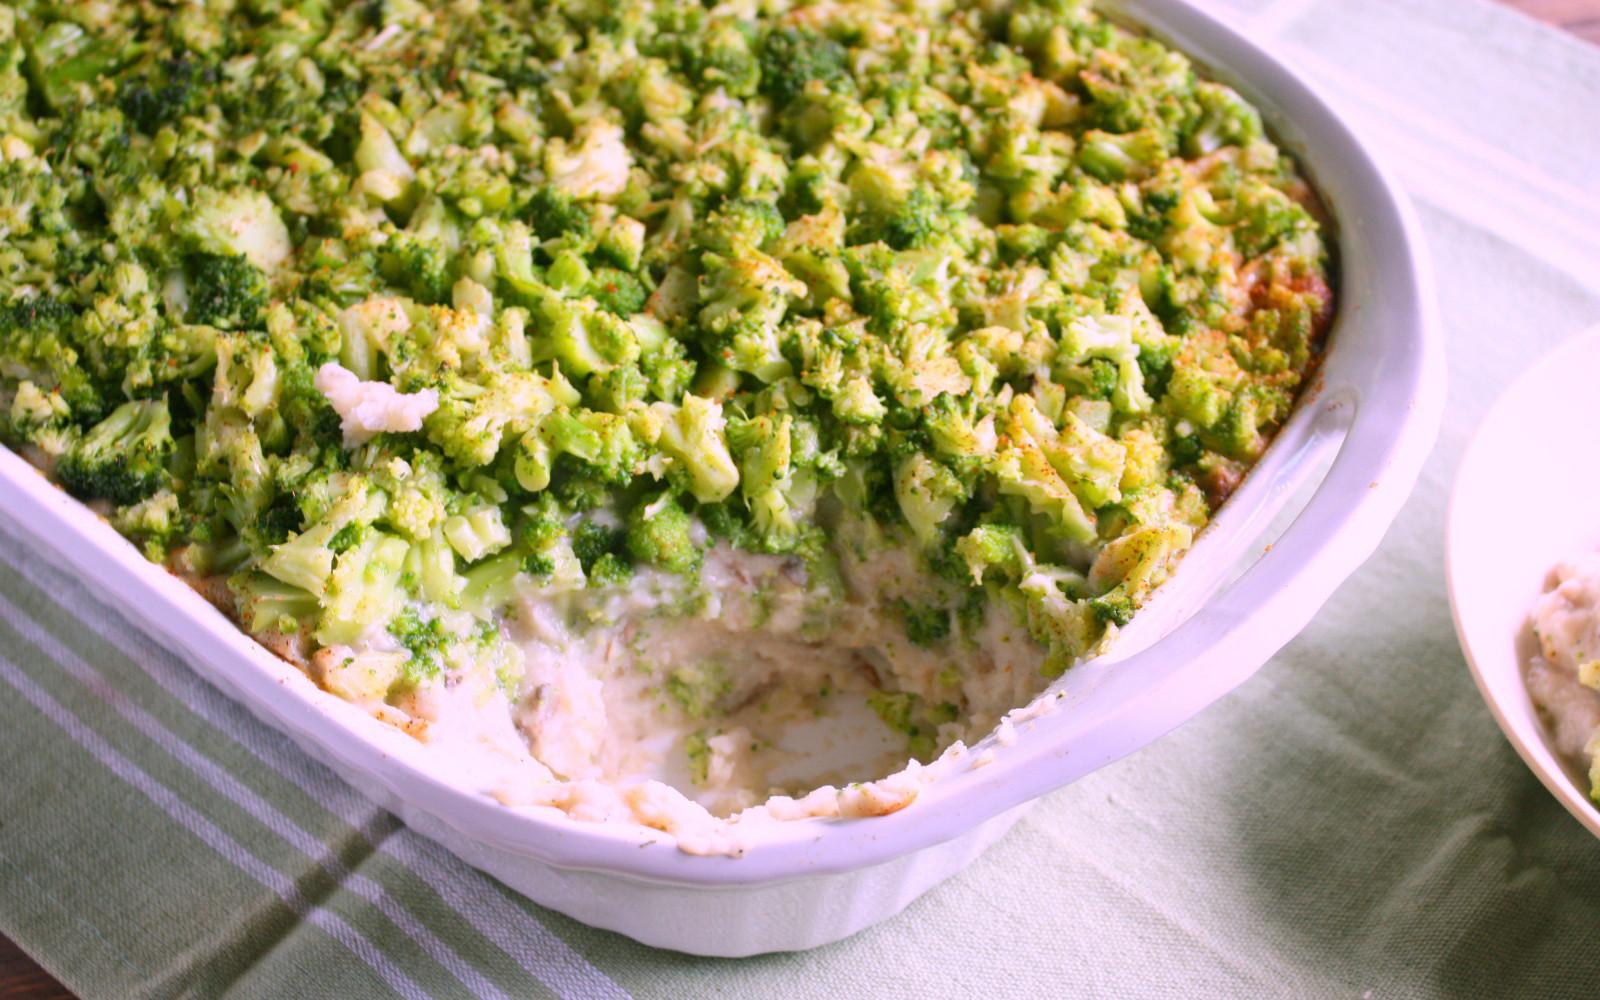 Mashed Potato Casserole With Broccoli and Cauliflower Gravy